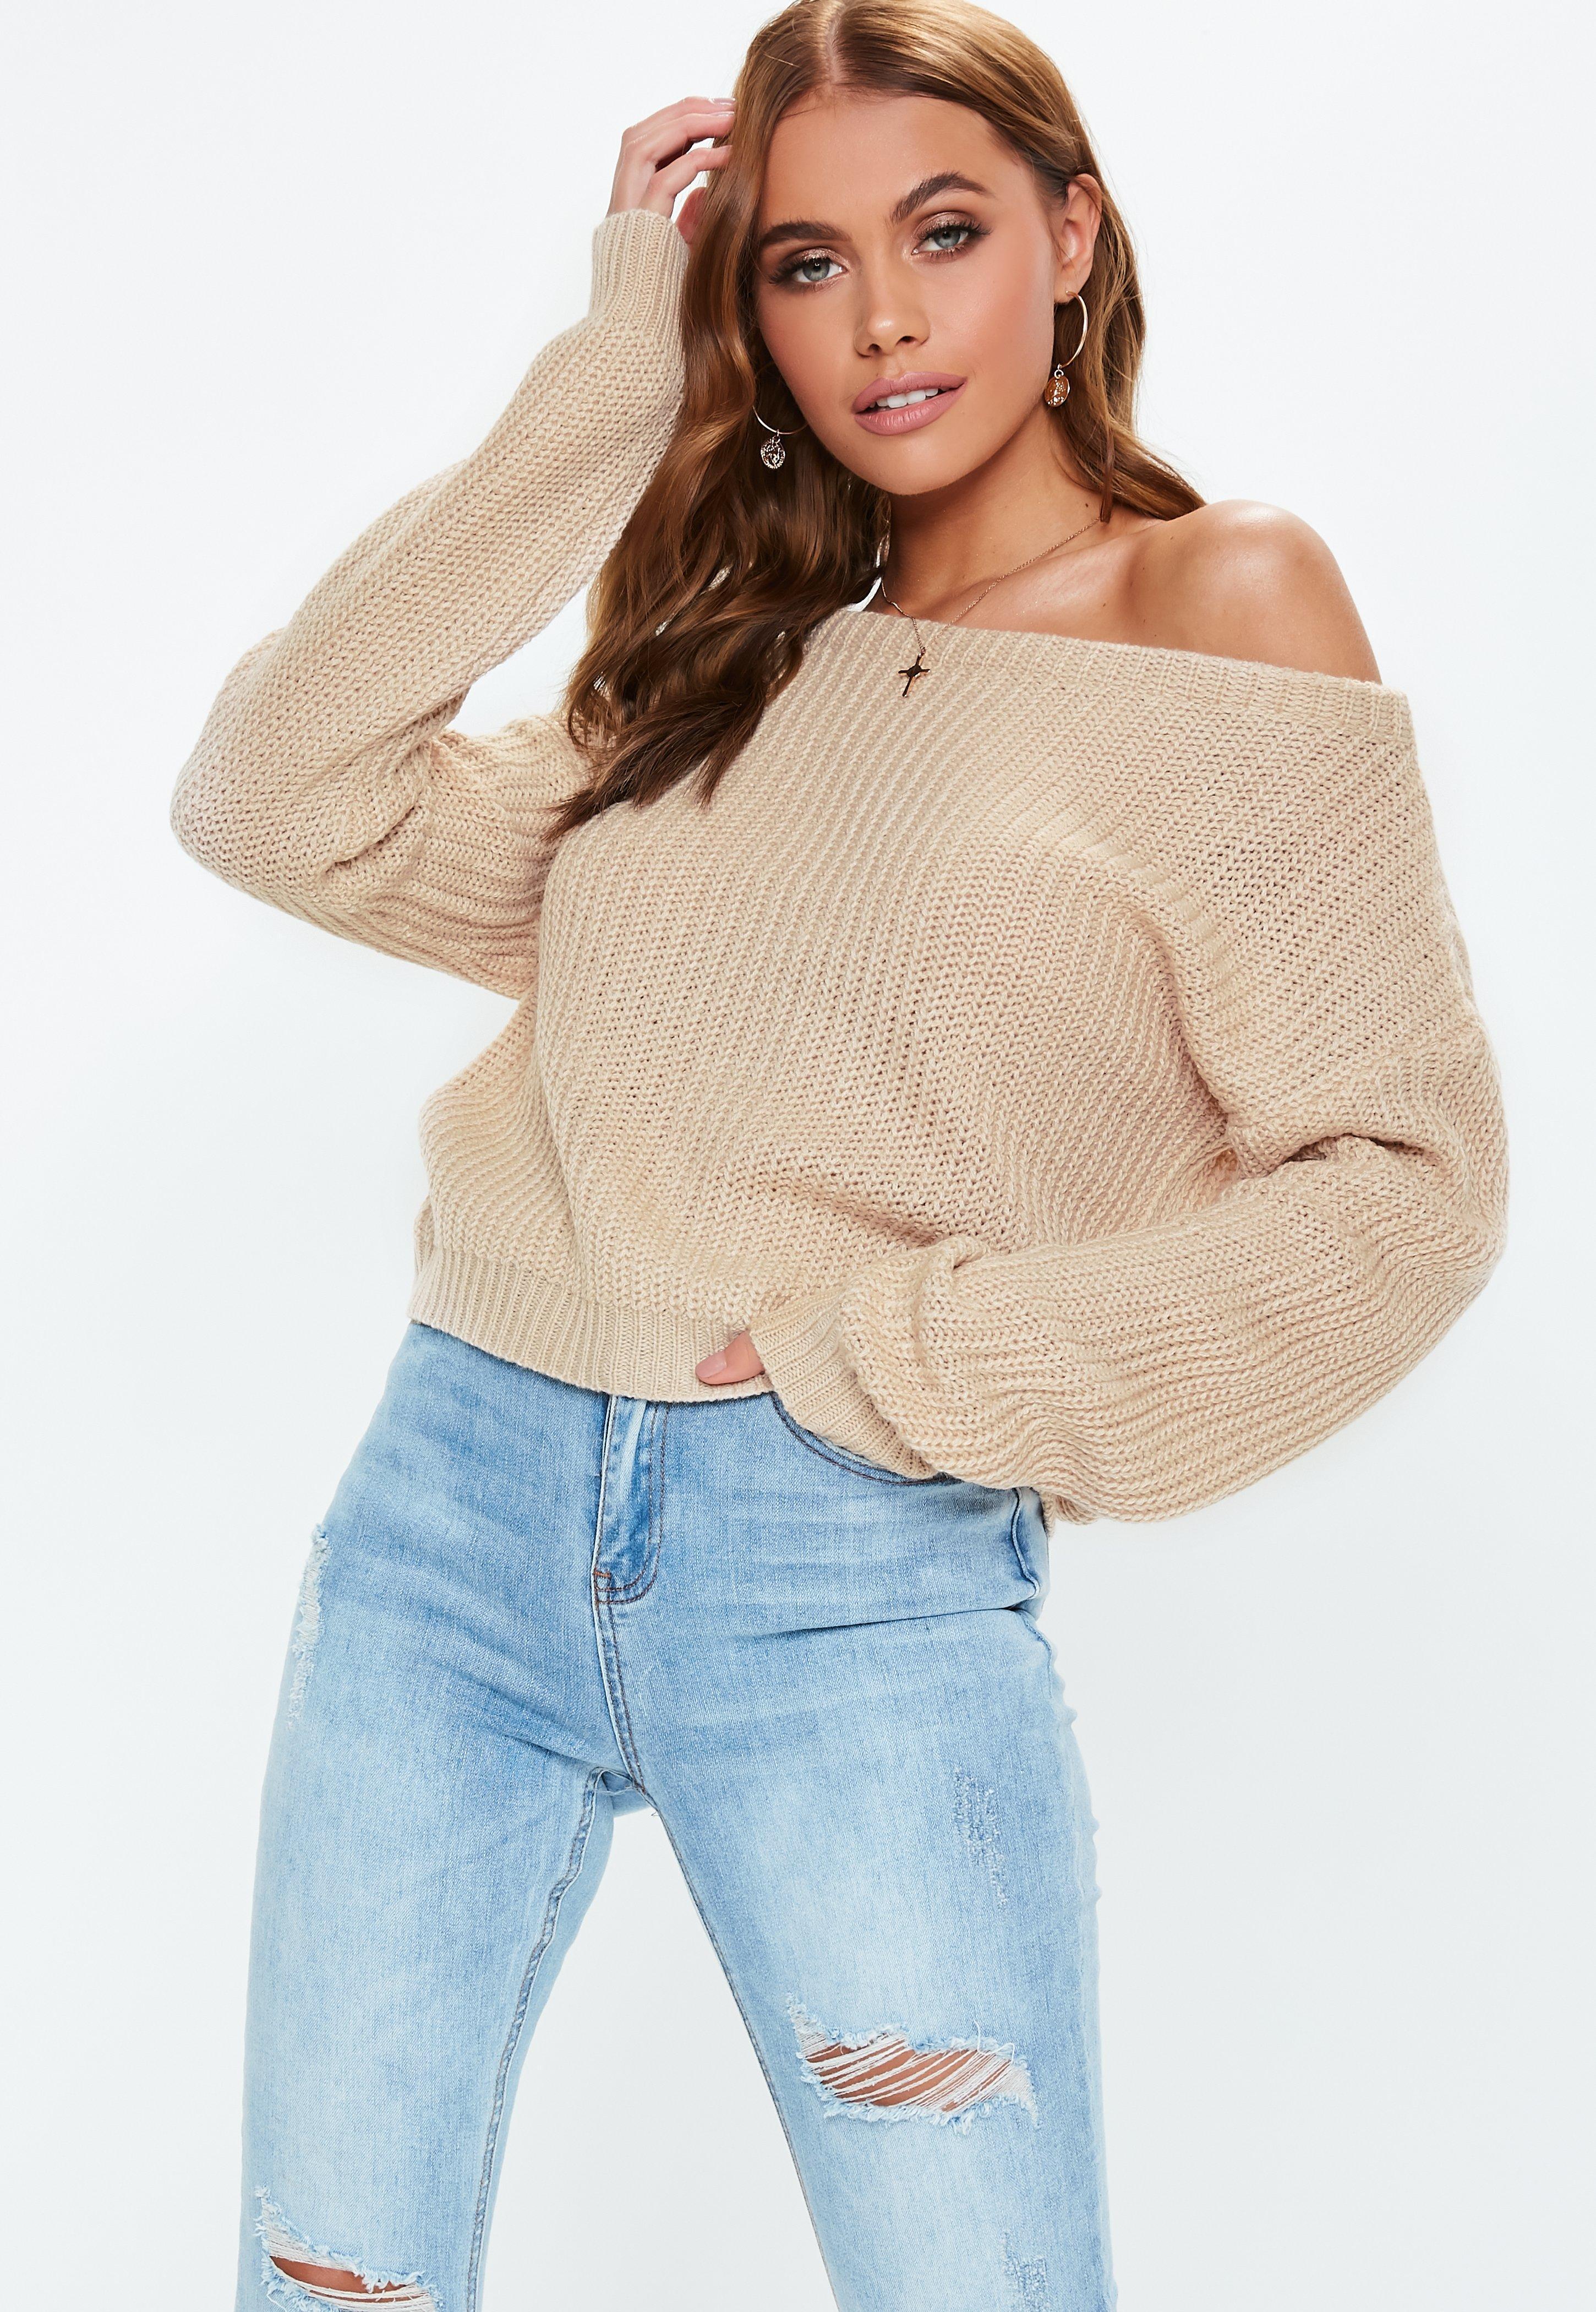 Staples Cropped Sweater - Sky Blue - Ryderwear